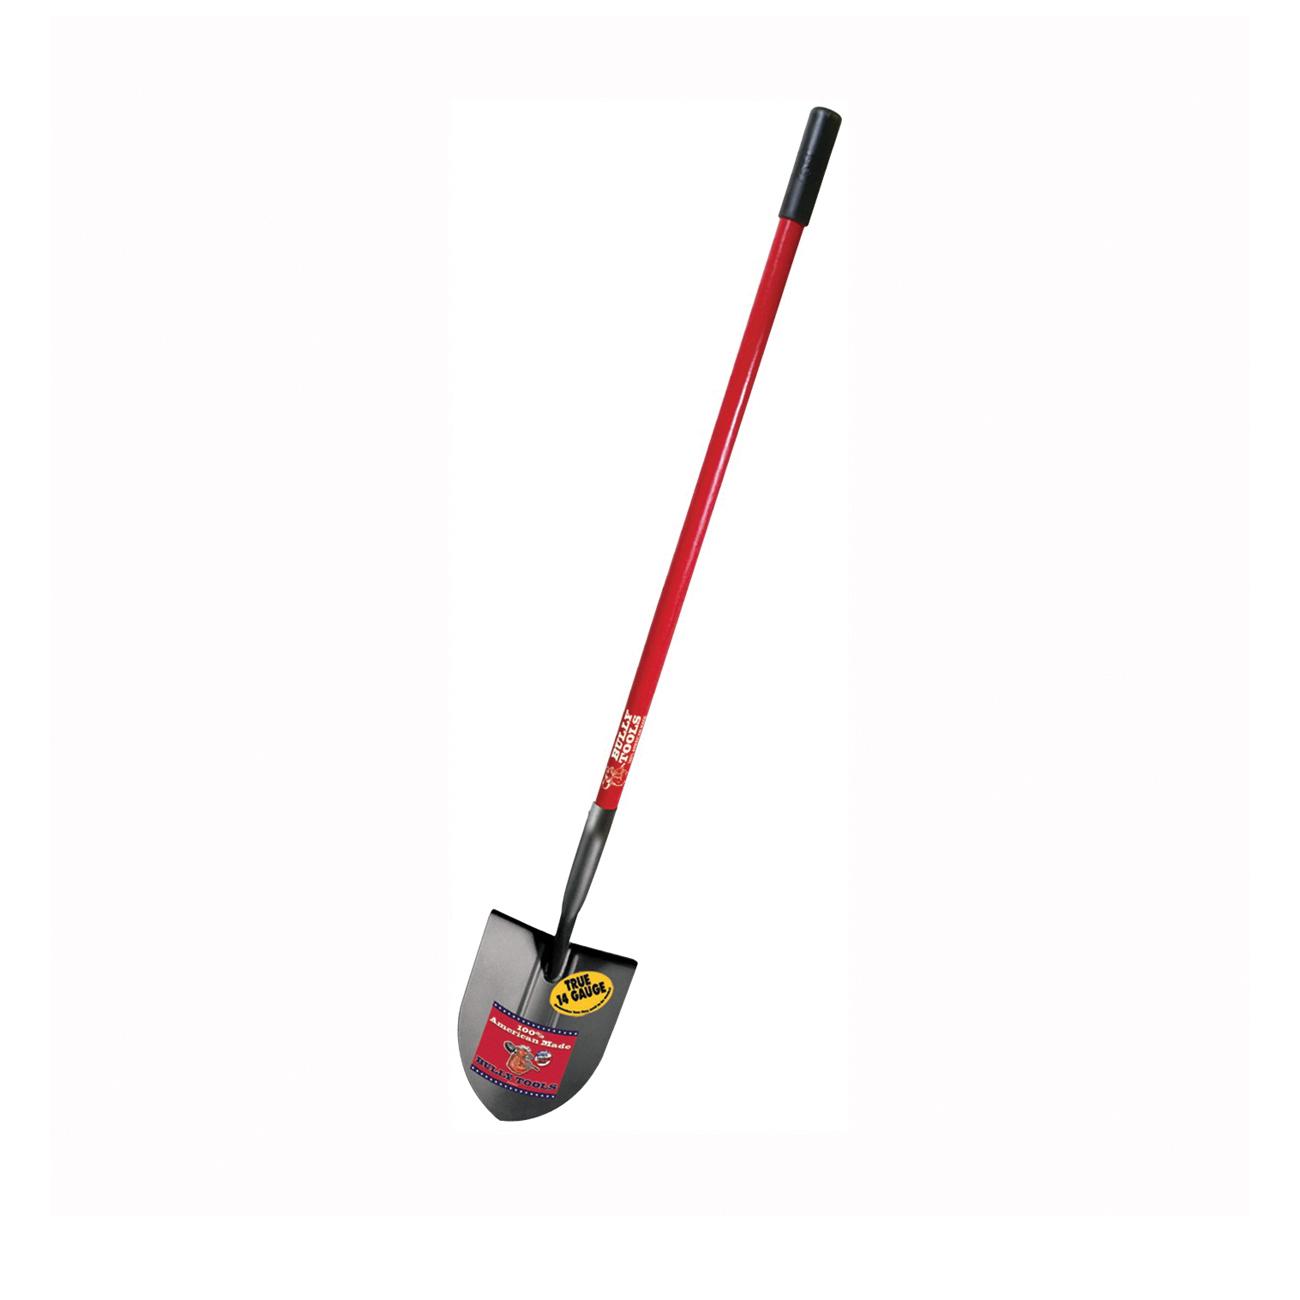 Picture of BULLY Tools 82515 Shovel, 9 in W Blade, 14 ga Gauge, Steel Blade, Fiberglass Handle, Long Handle